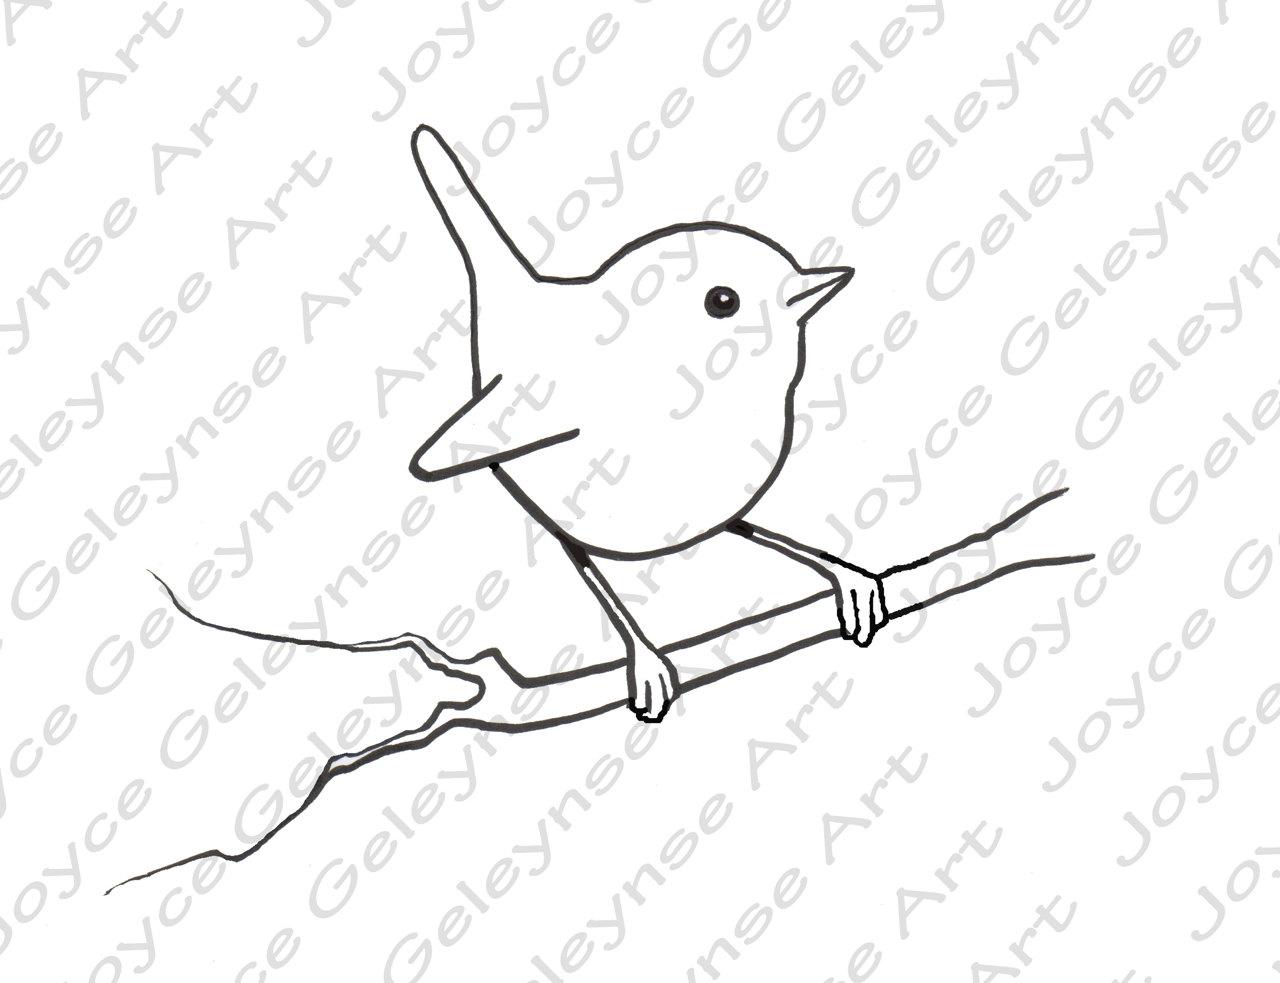 Bird clipart easy. Digital stamp clip art